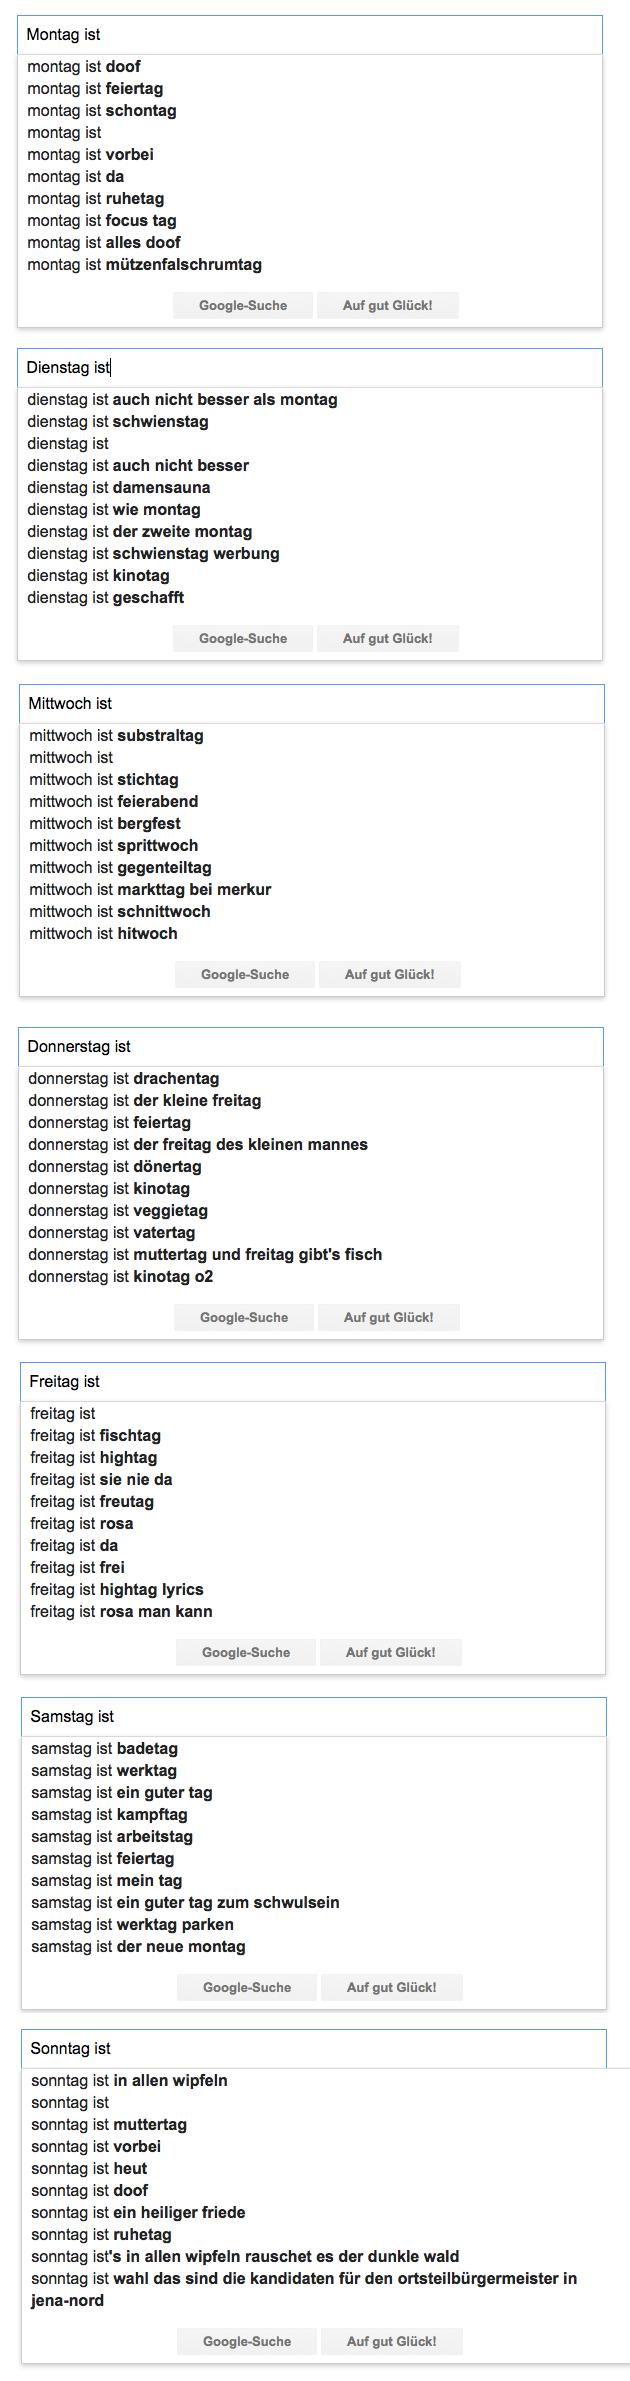 tage-nach-google